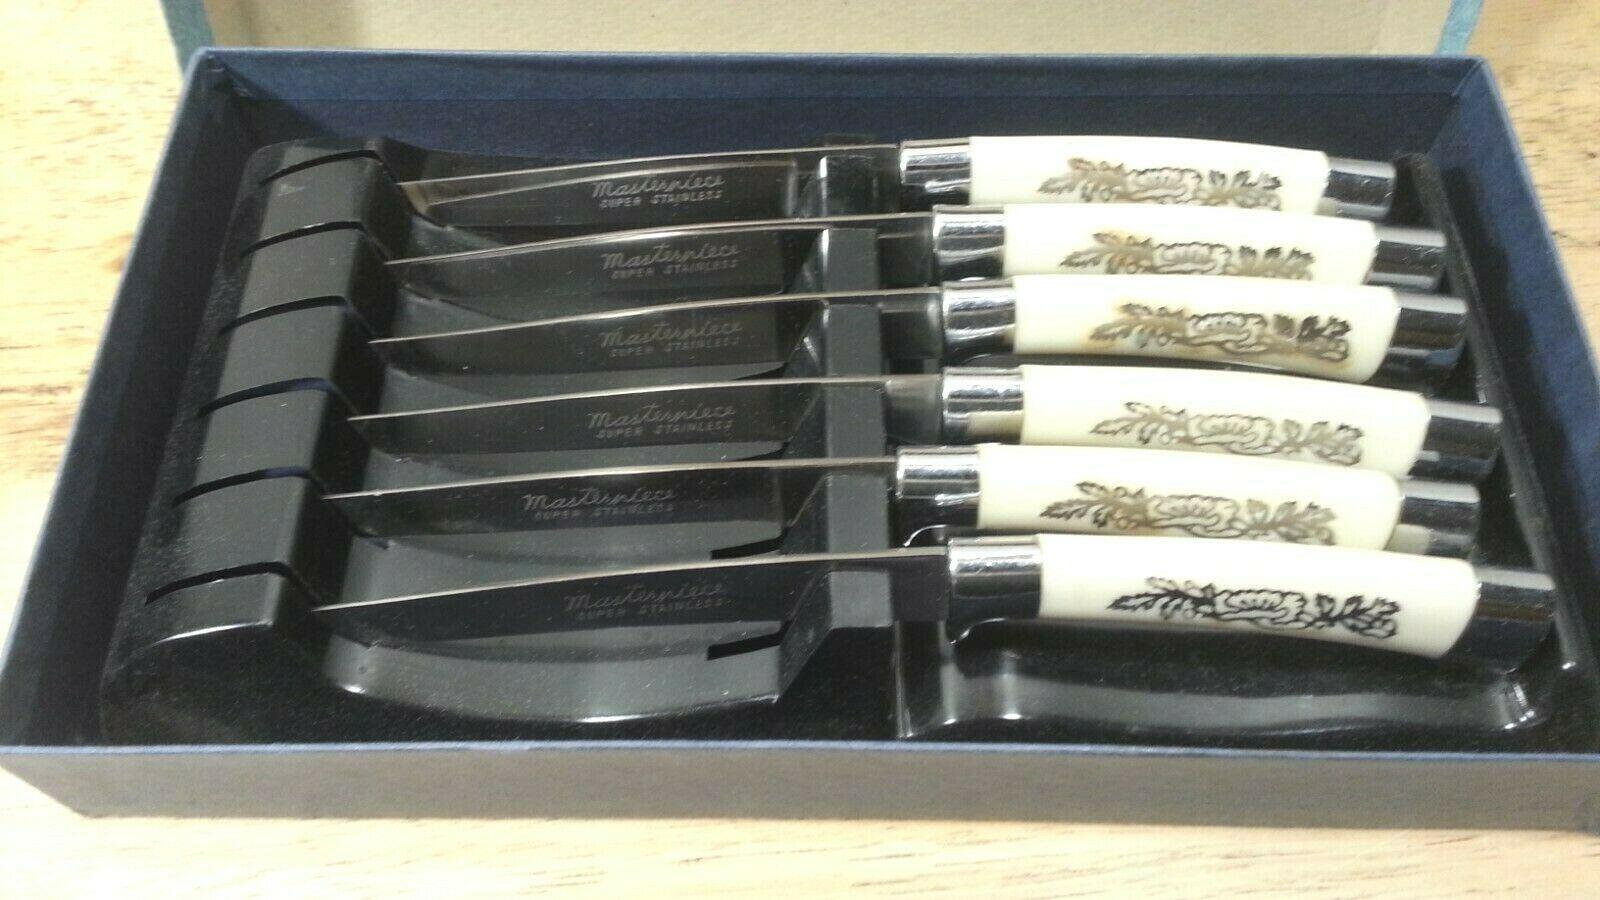 Vintage - Steak Knife Set - Royal Brand - 6 piece - Original Box & Storage Tray  - $12.36